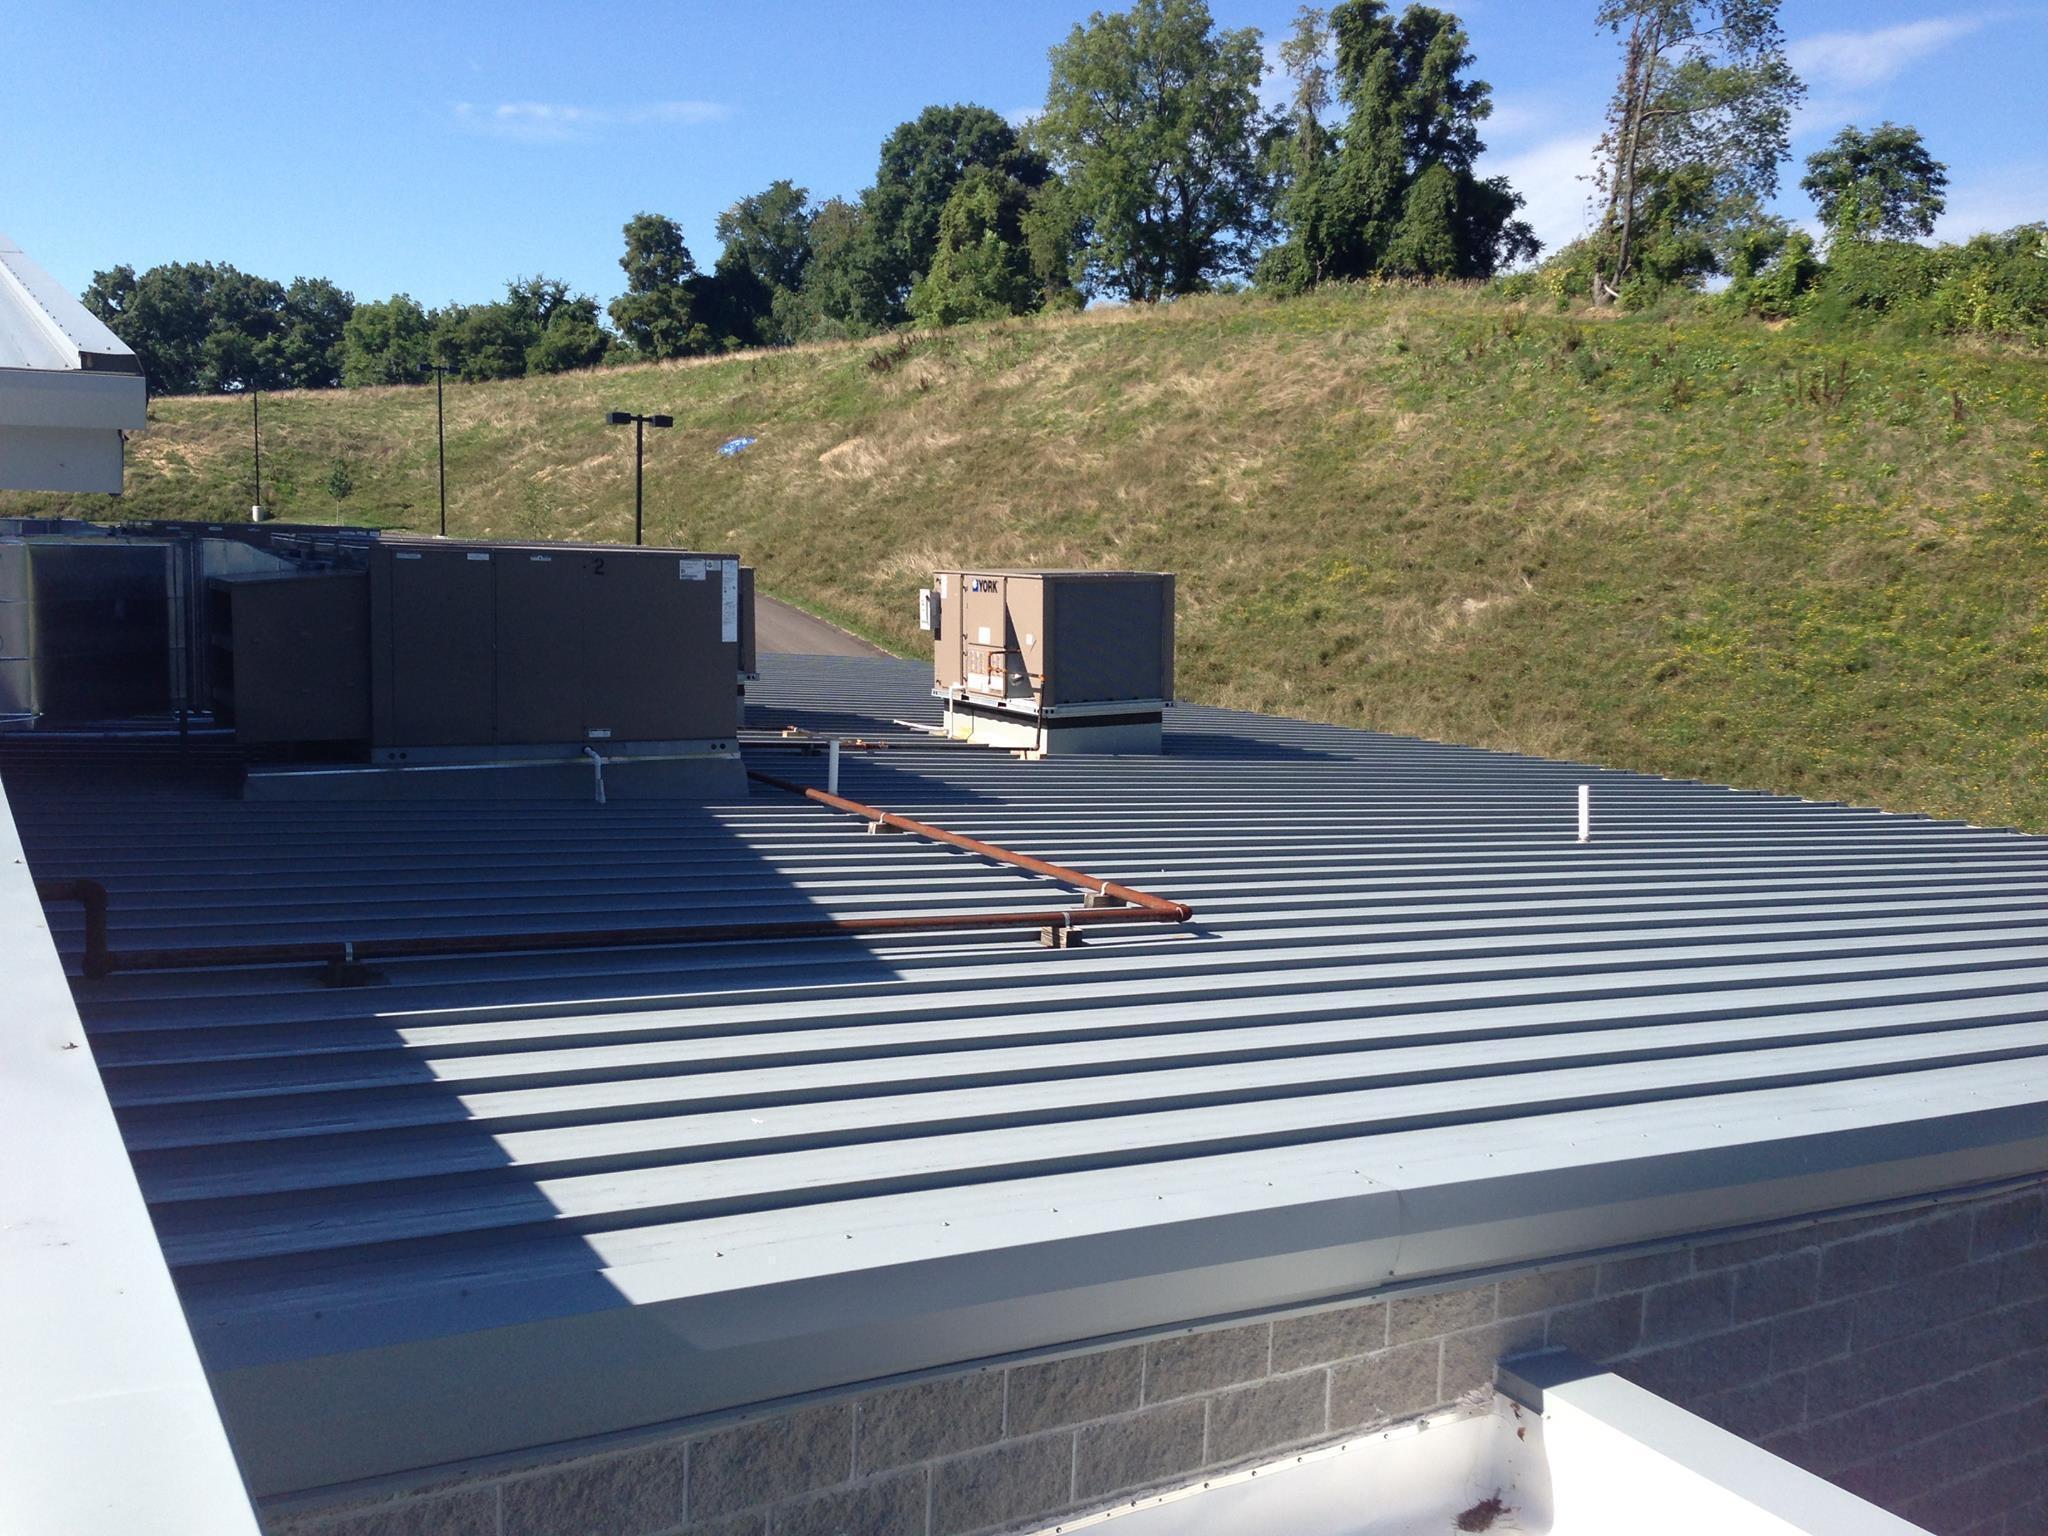 RoofCrafters-Savannah image 63